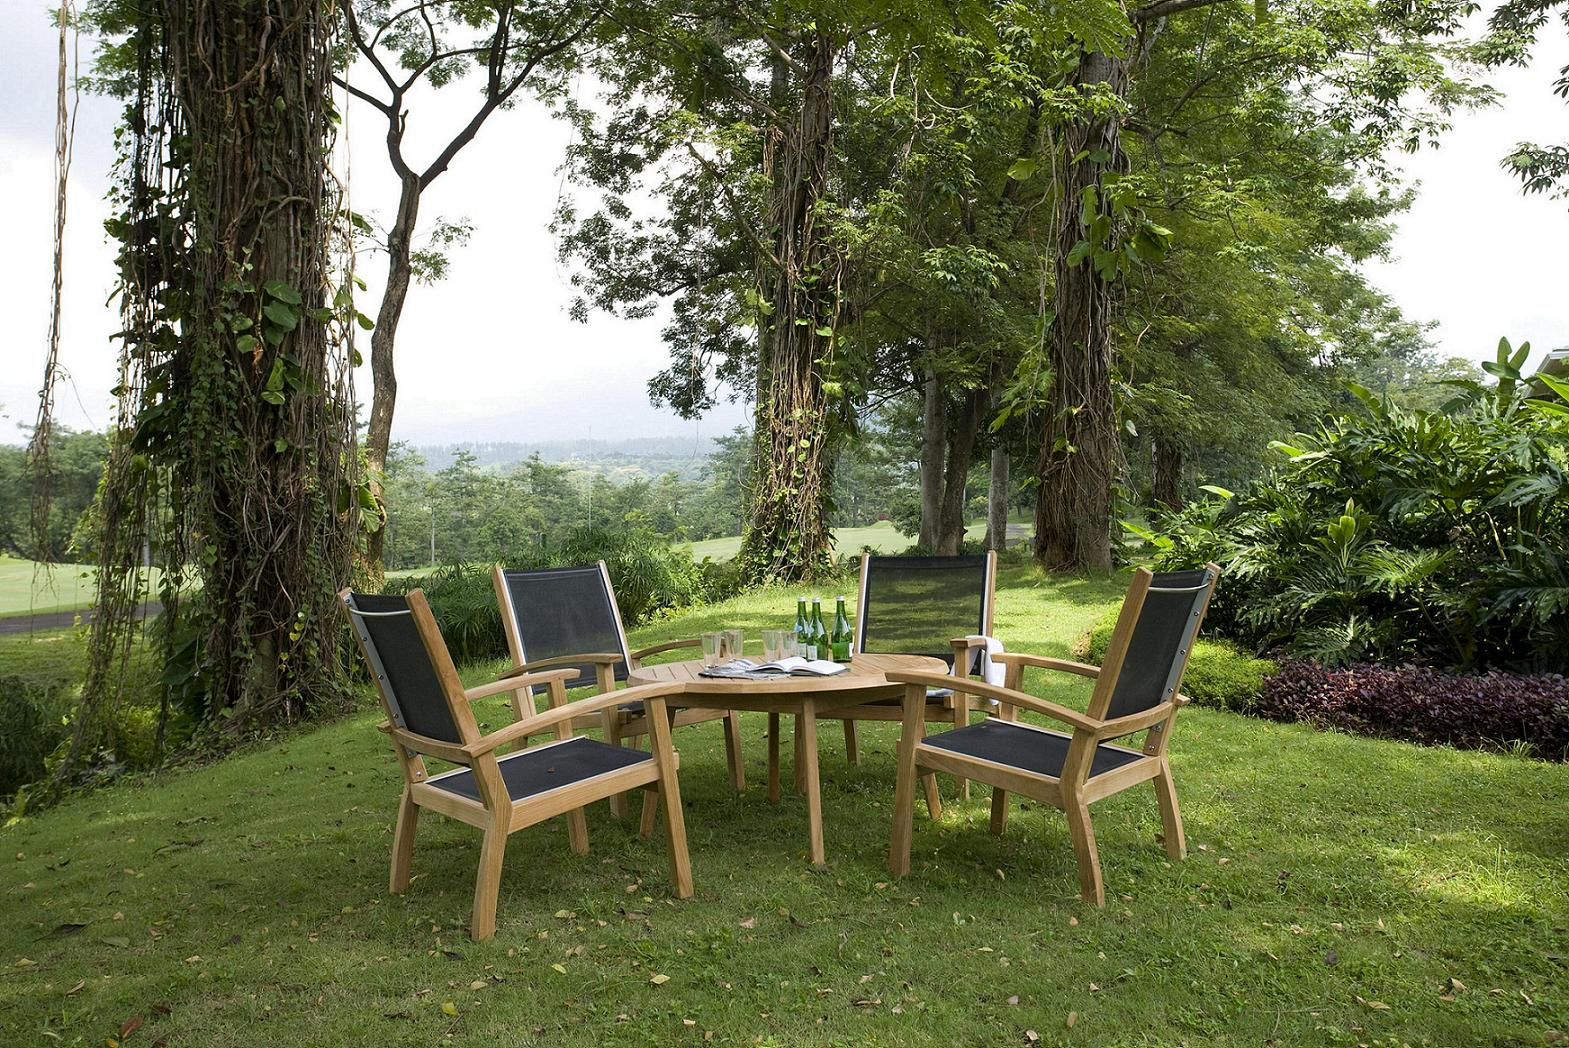 Conversation patio sets calgary design and ideas - Cheap patio furniture calgary ...